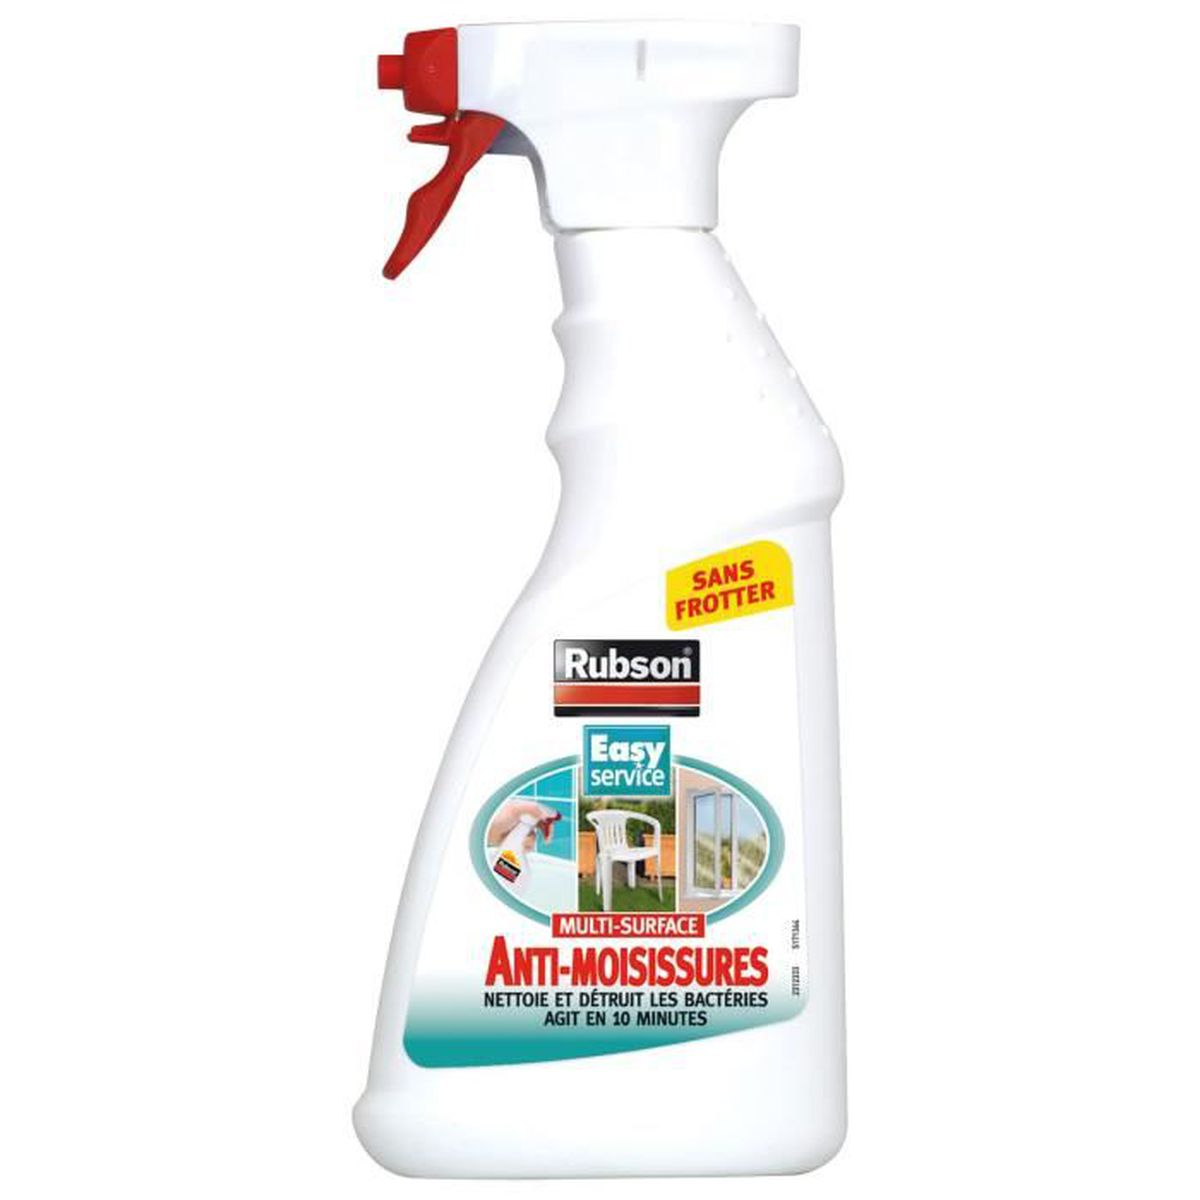 RUBSON Anti-moisissures - Pulvérisateur 18 ml